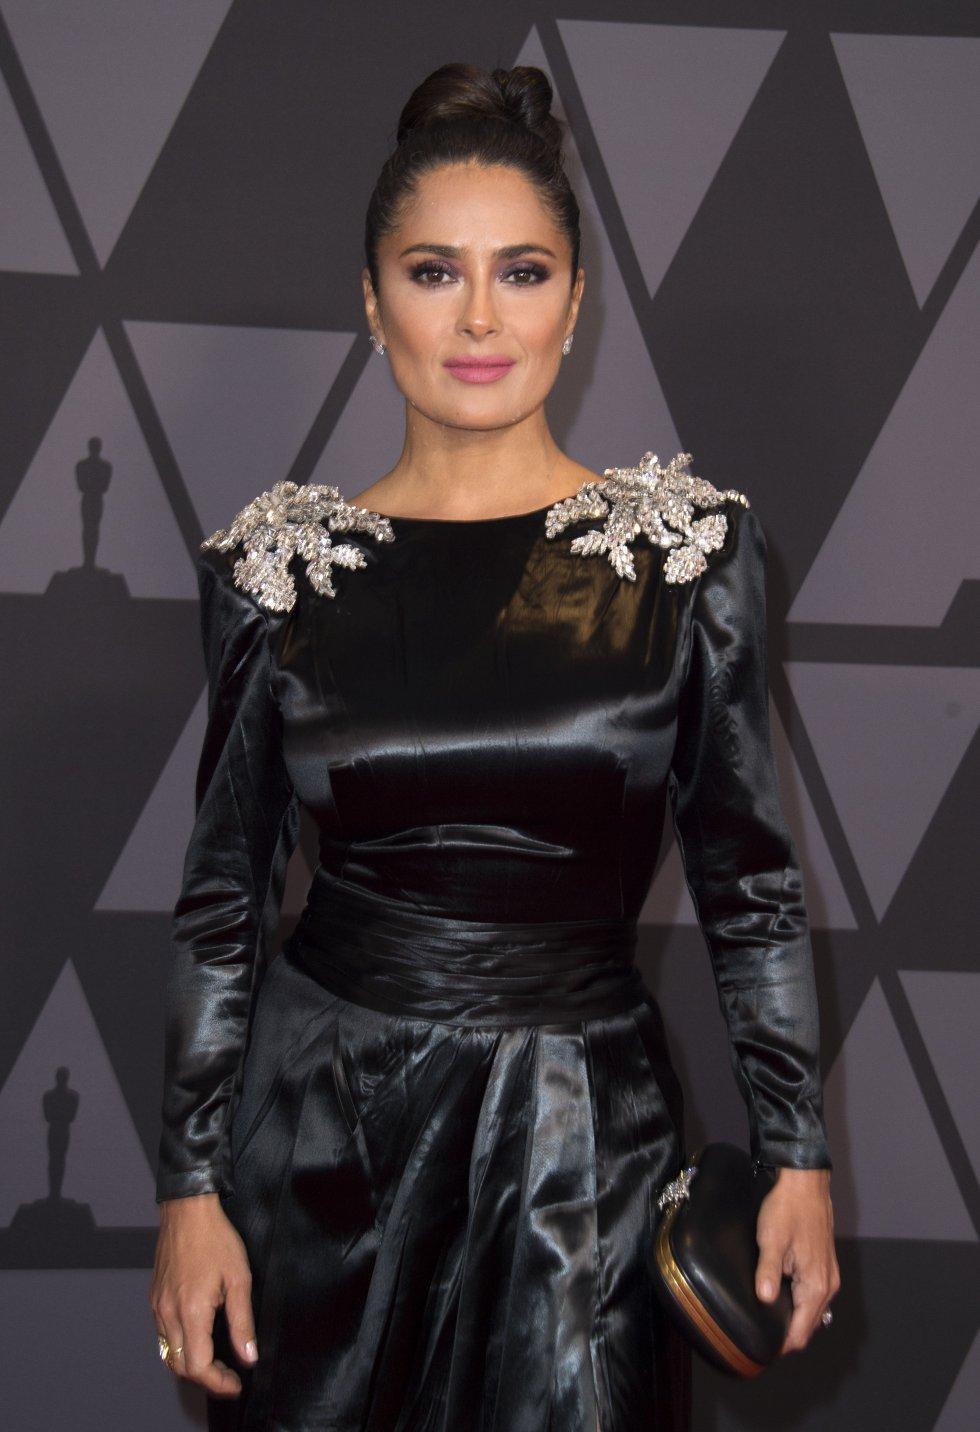 Comenzó su carrera en México, protagonizando la telenovela Teresa